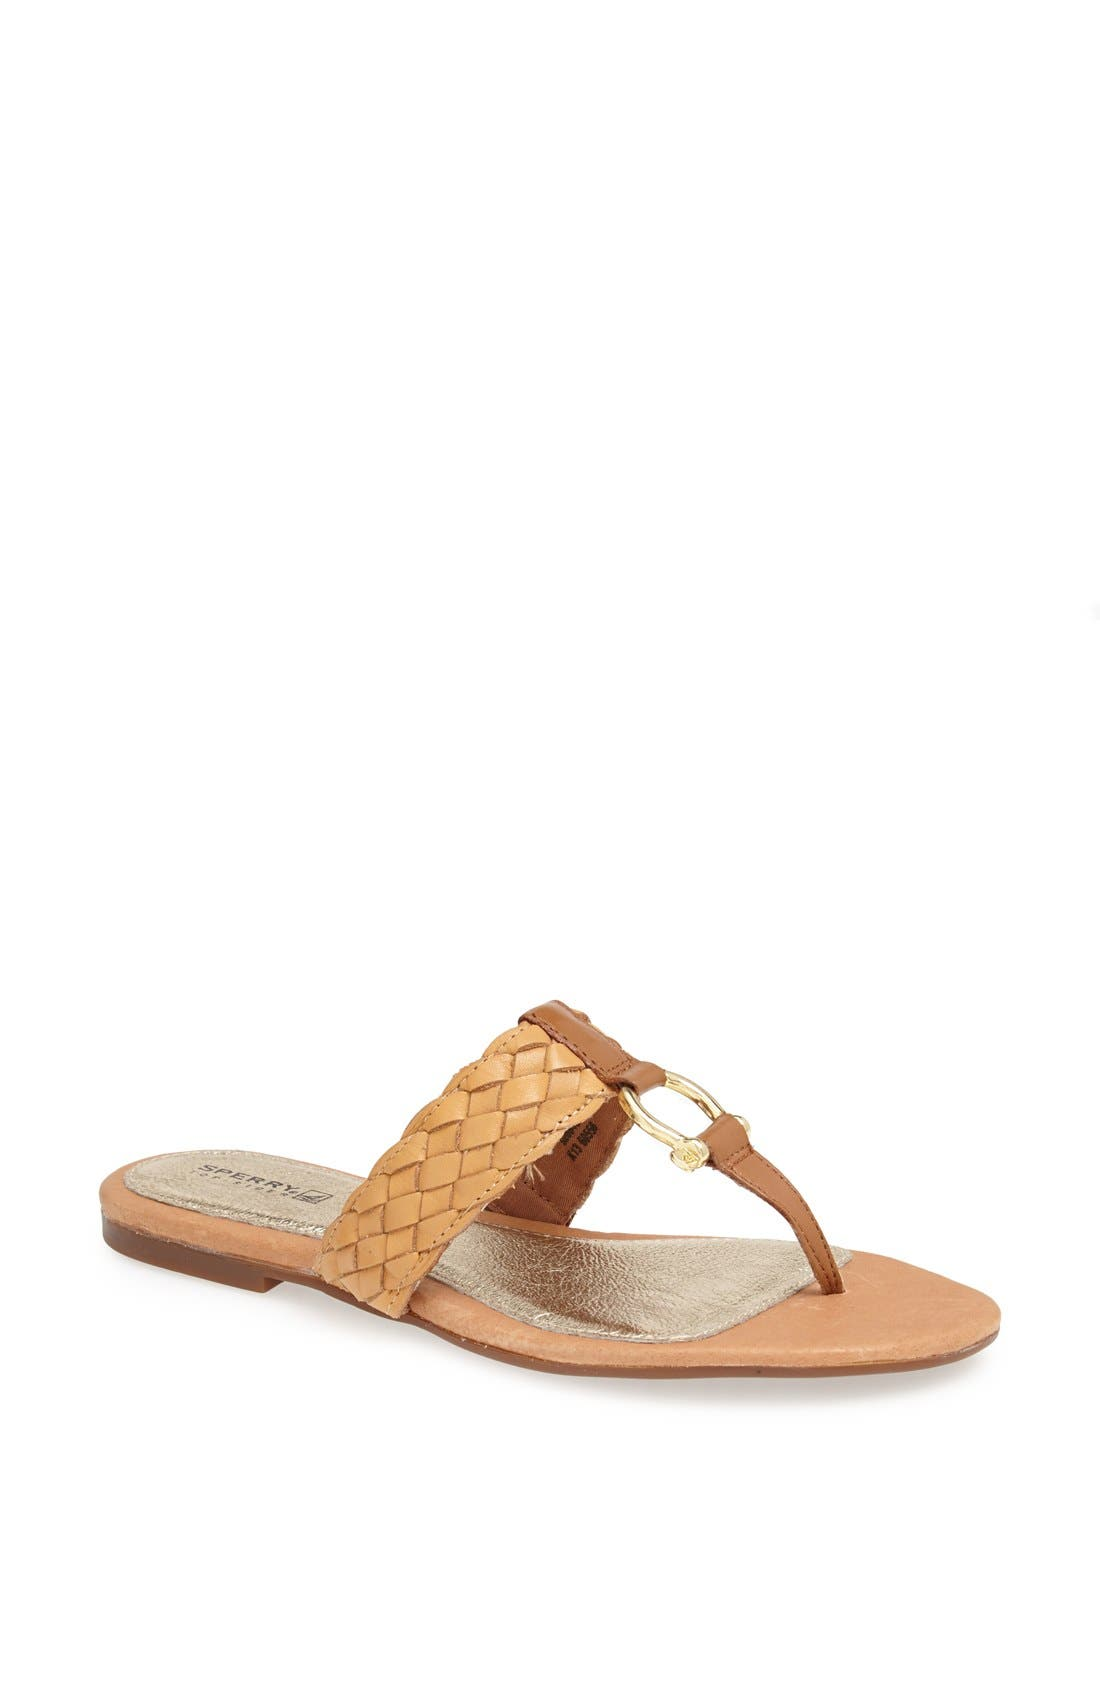 Alternate Image 1 Selected - Sperry Top-Sider® 'Carlin' Sandal